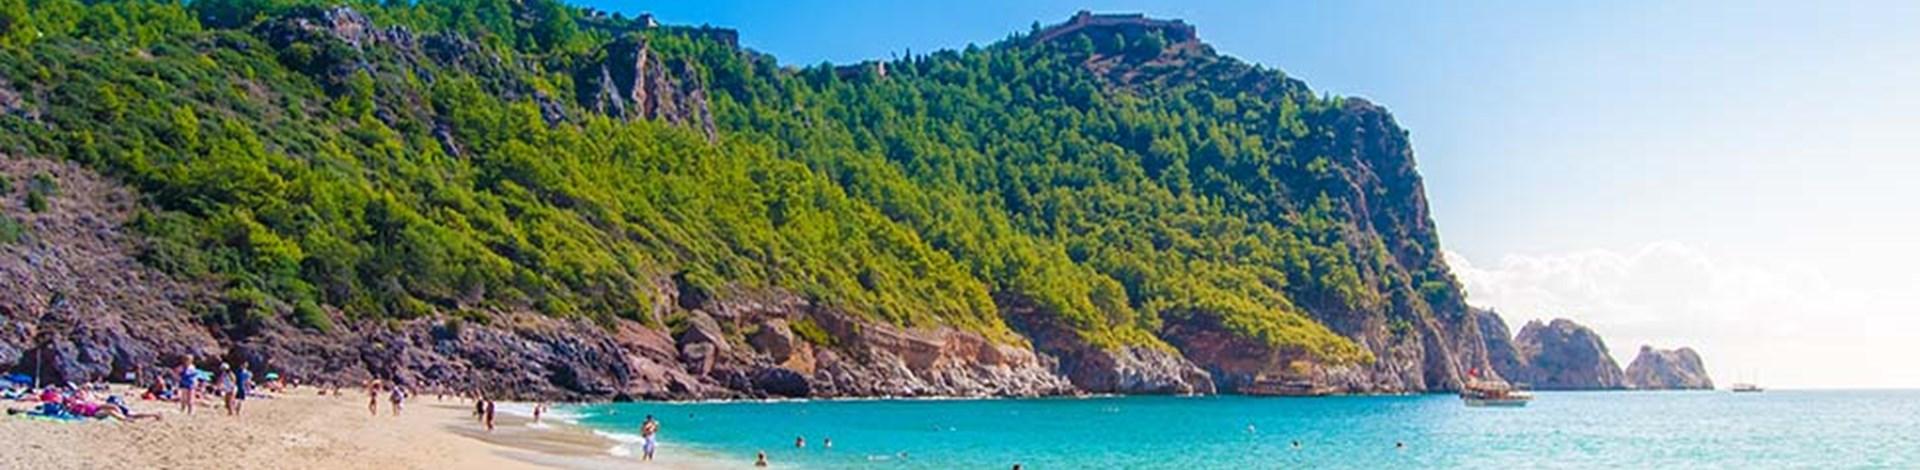 Alanya Damlatas Beach